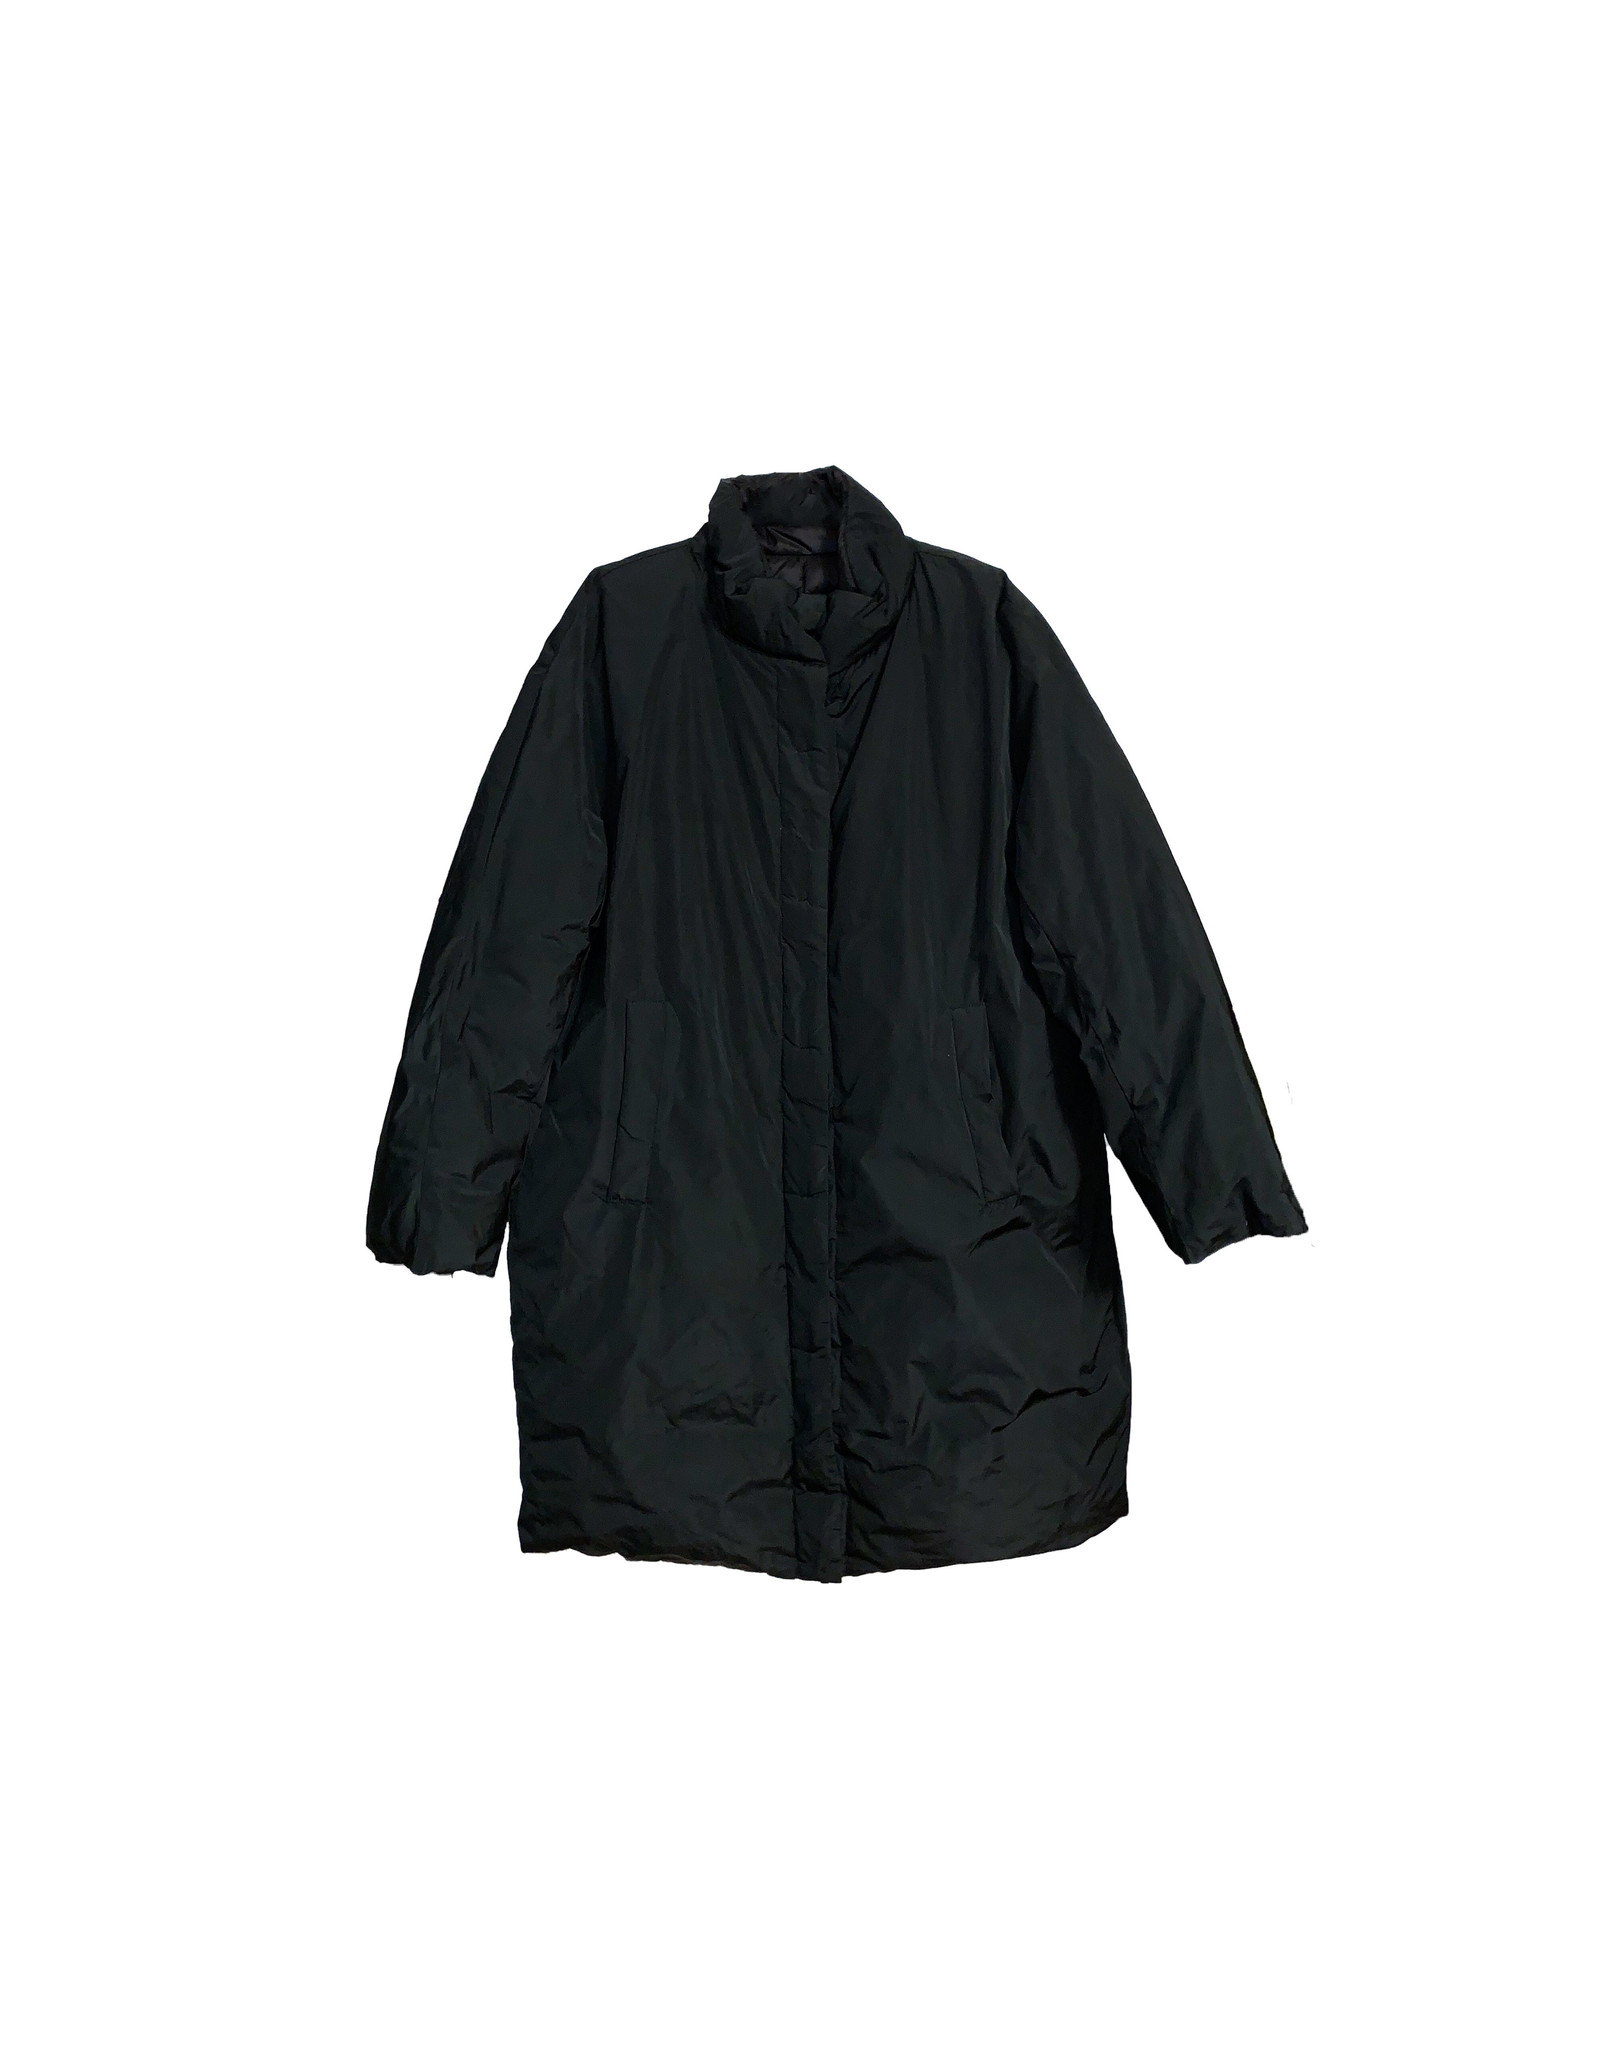 WEEKEND MaxMara WEEKEND Maxmara Reversible Puffer Coat Size: 10